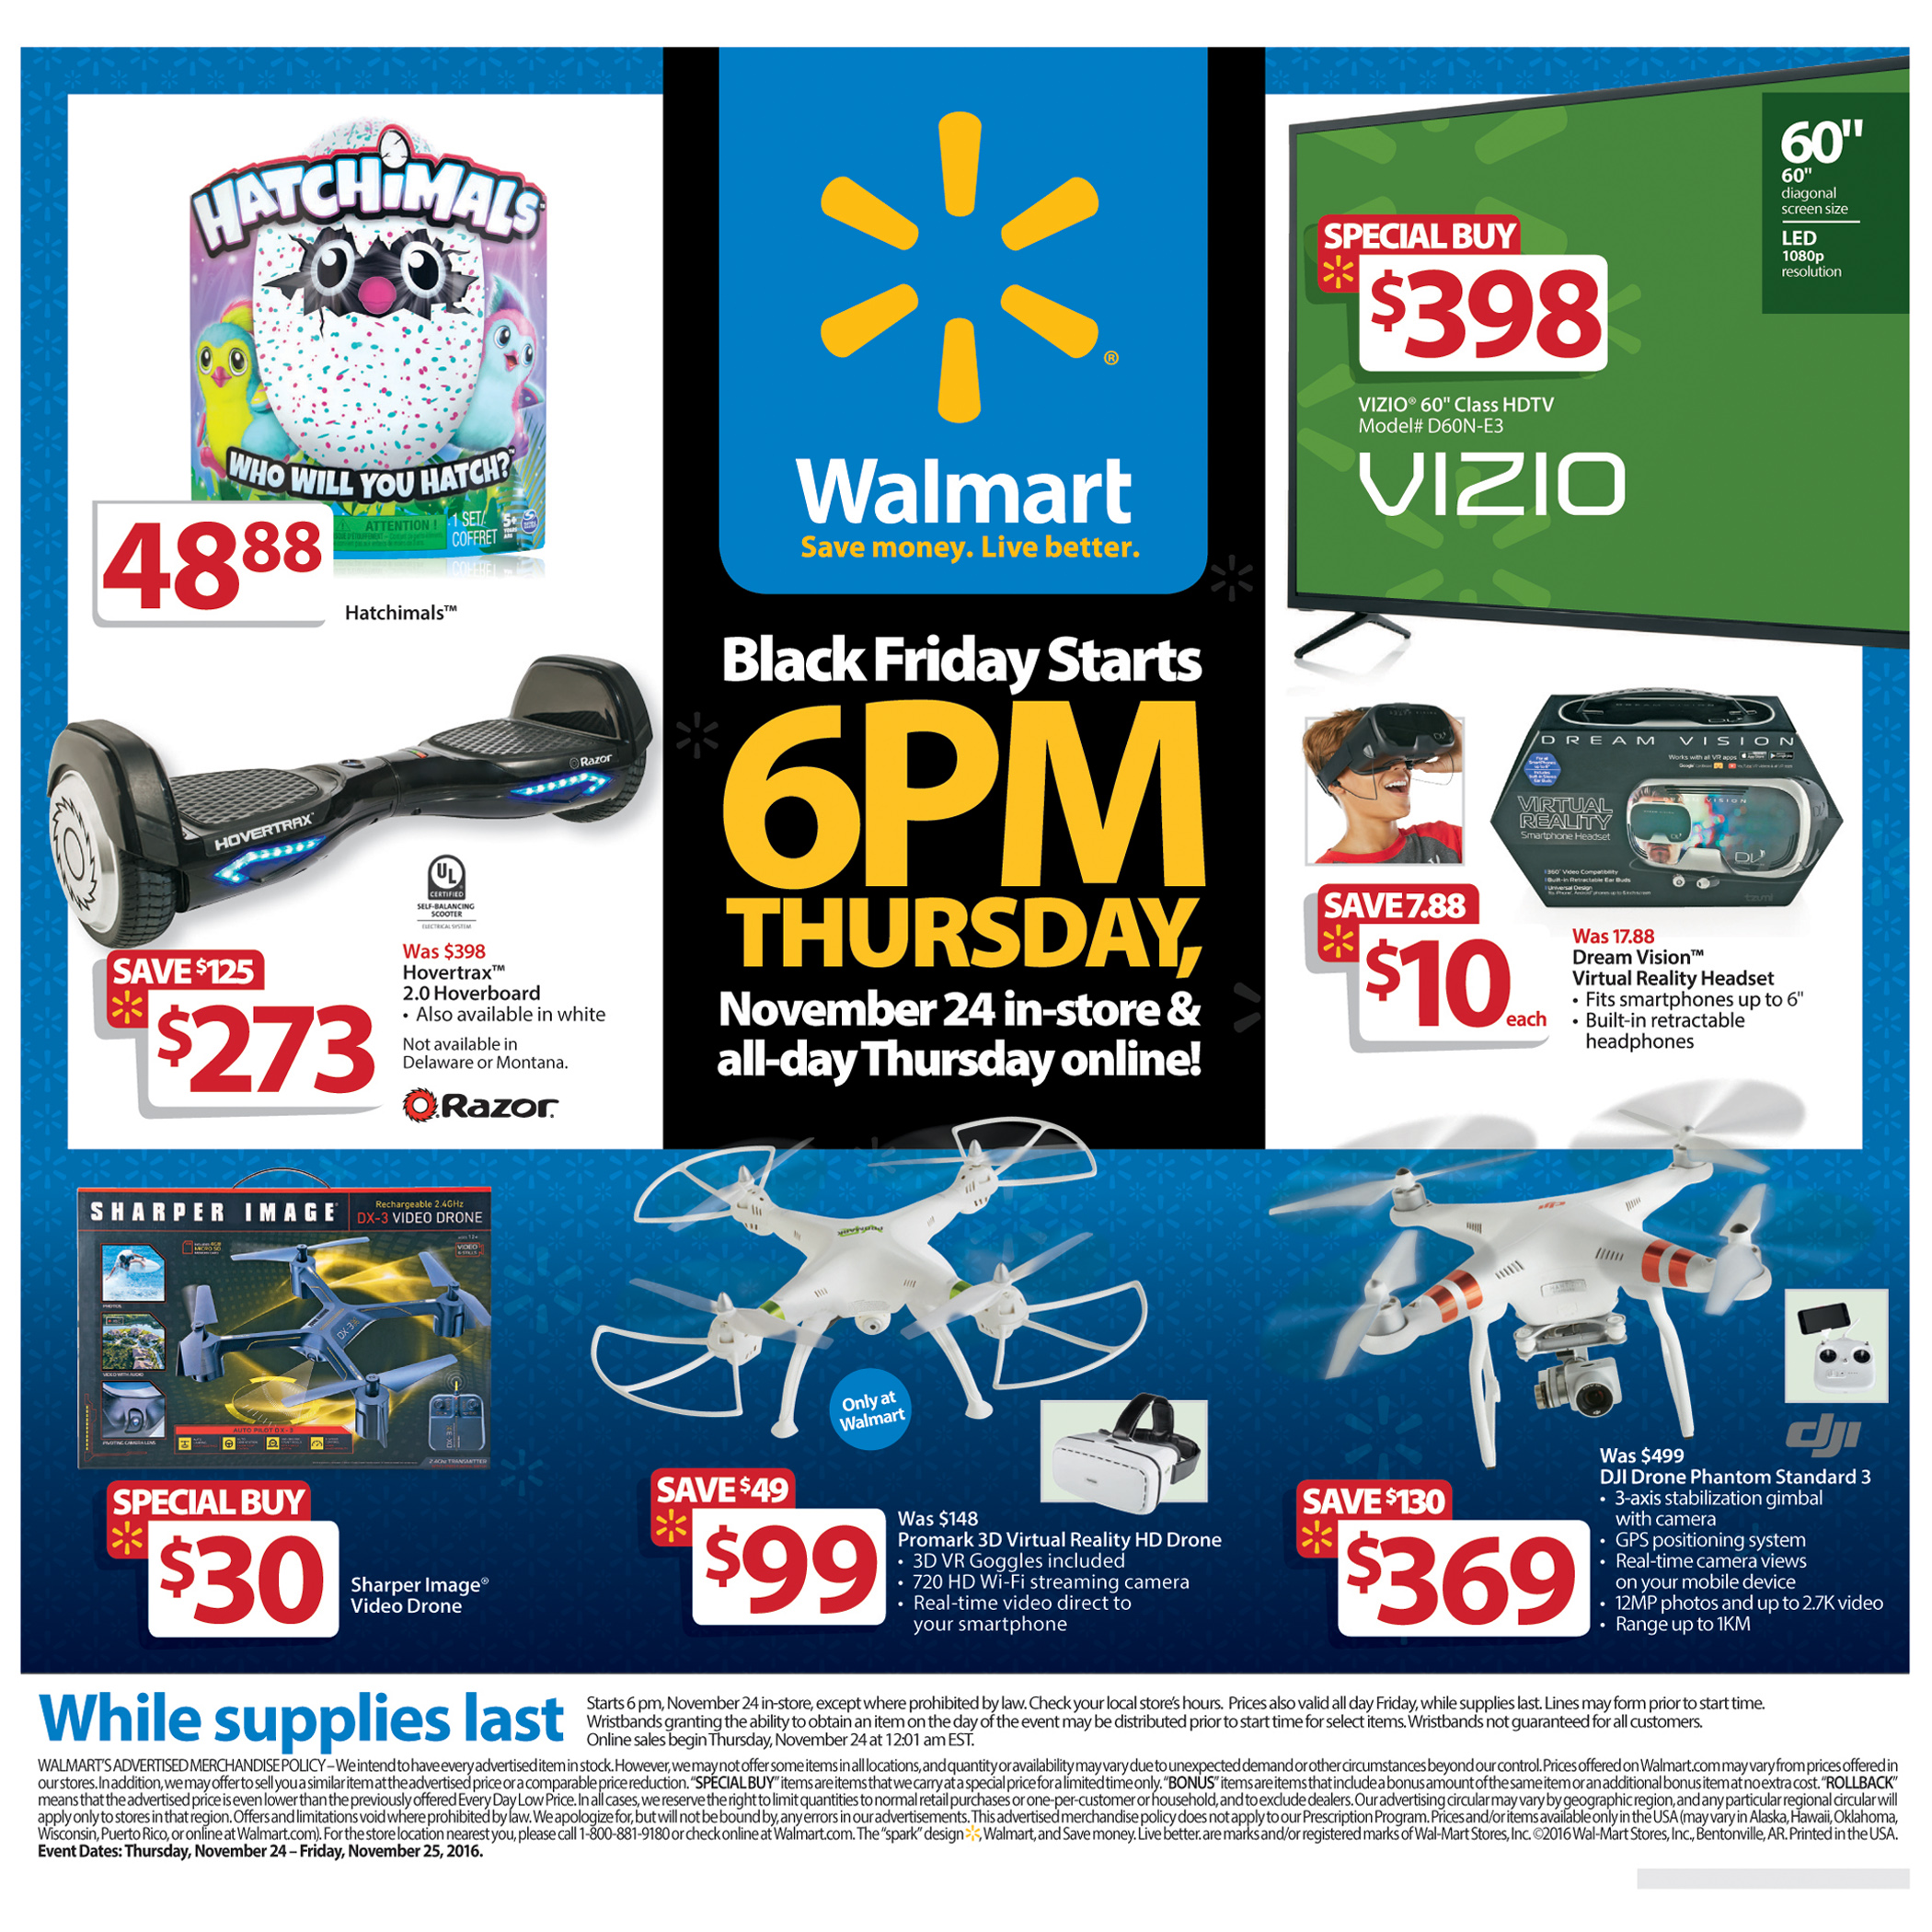 Walmart Unveils Black Friday 2016 Plans Great Deals More Availability